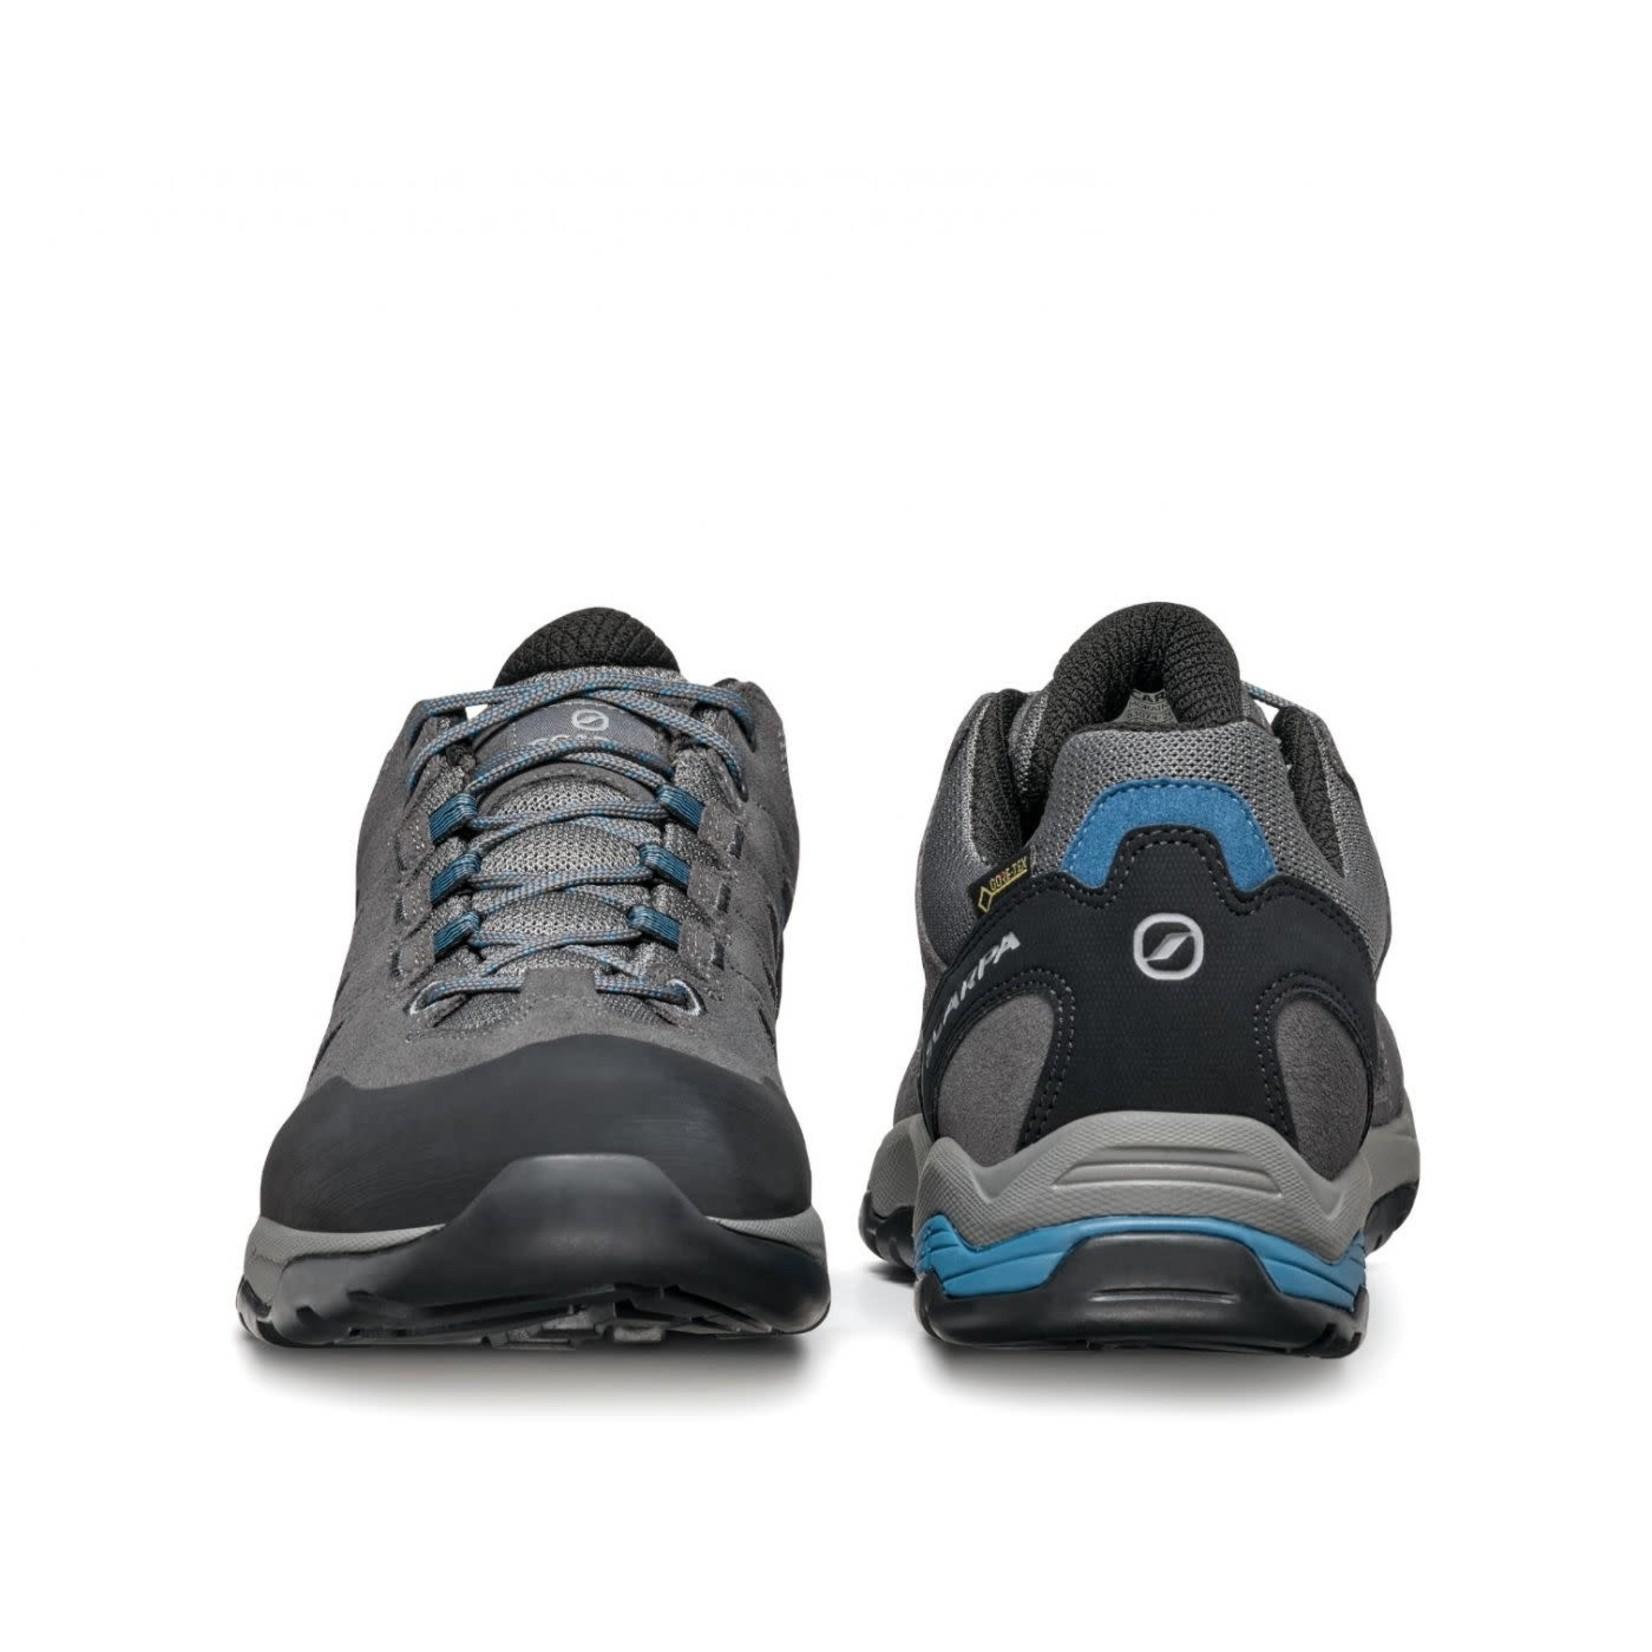 Scarpa Chaussure Scarpa Moraine GTX - Homme